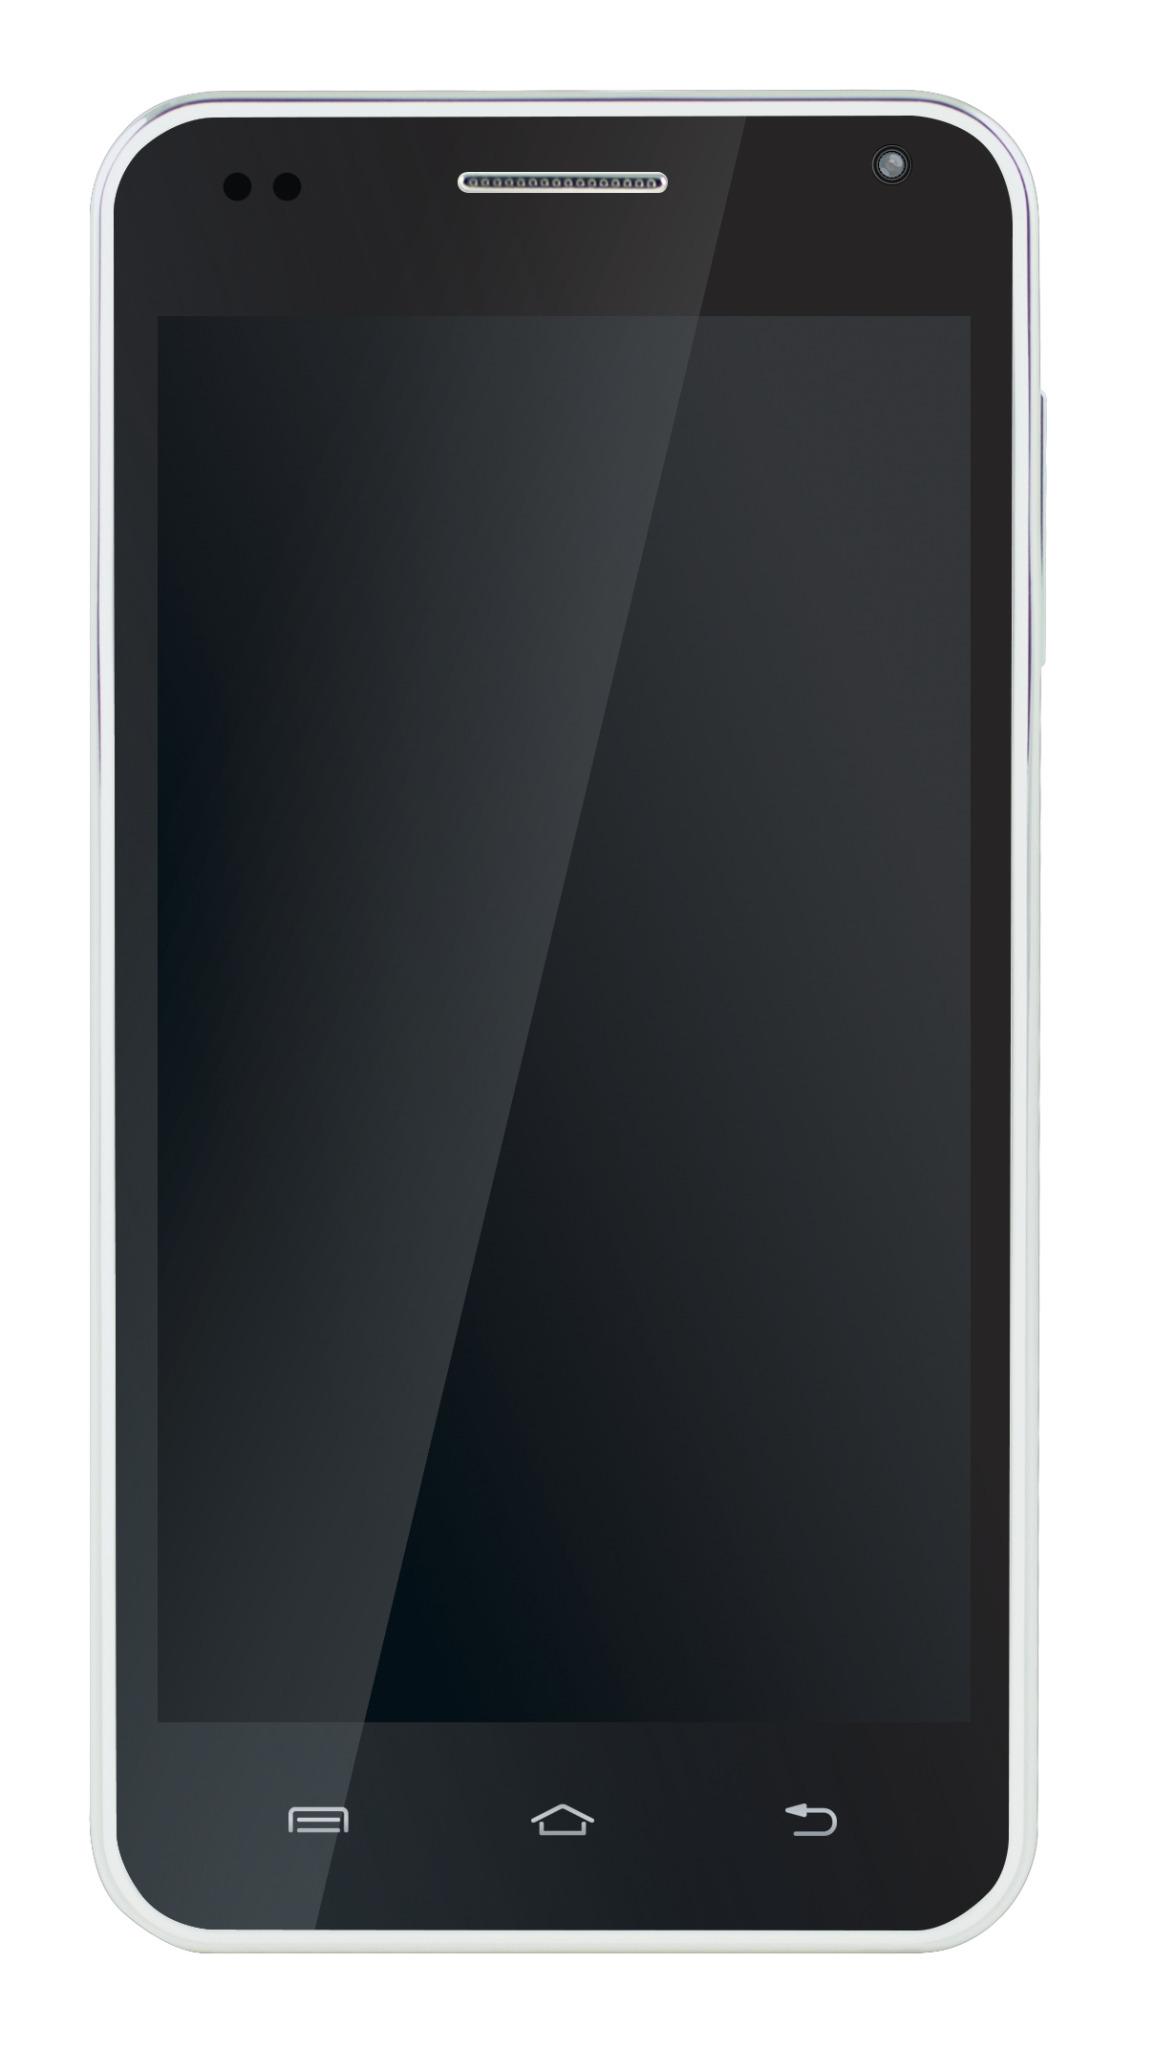 ACCELLORIZE 33111 BLACK 4.5 IN SMARTPHONE DUAL SIM UNLOCKED